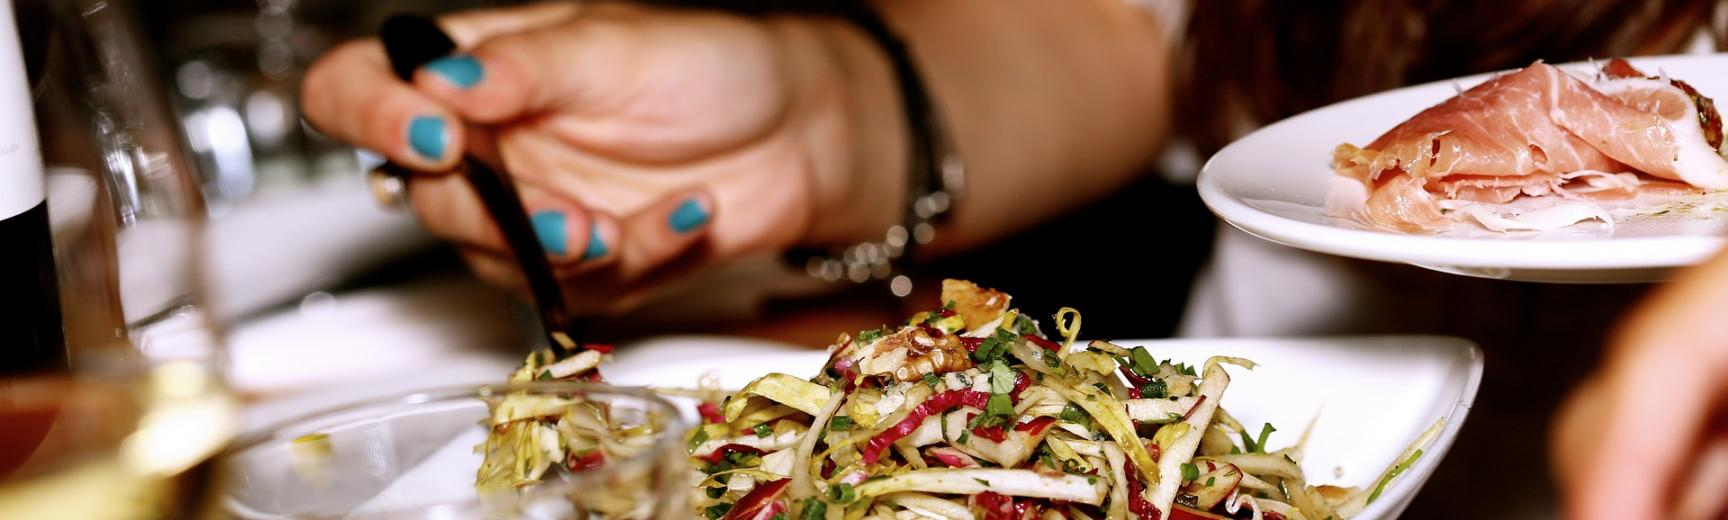 salad 569156